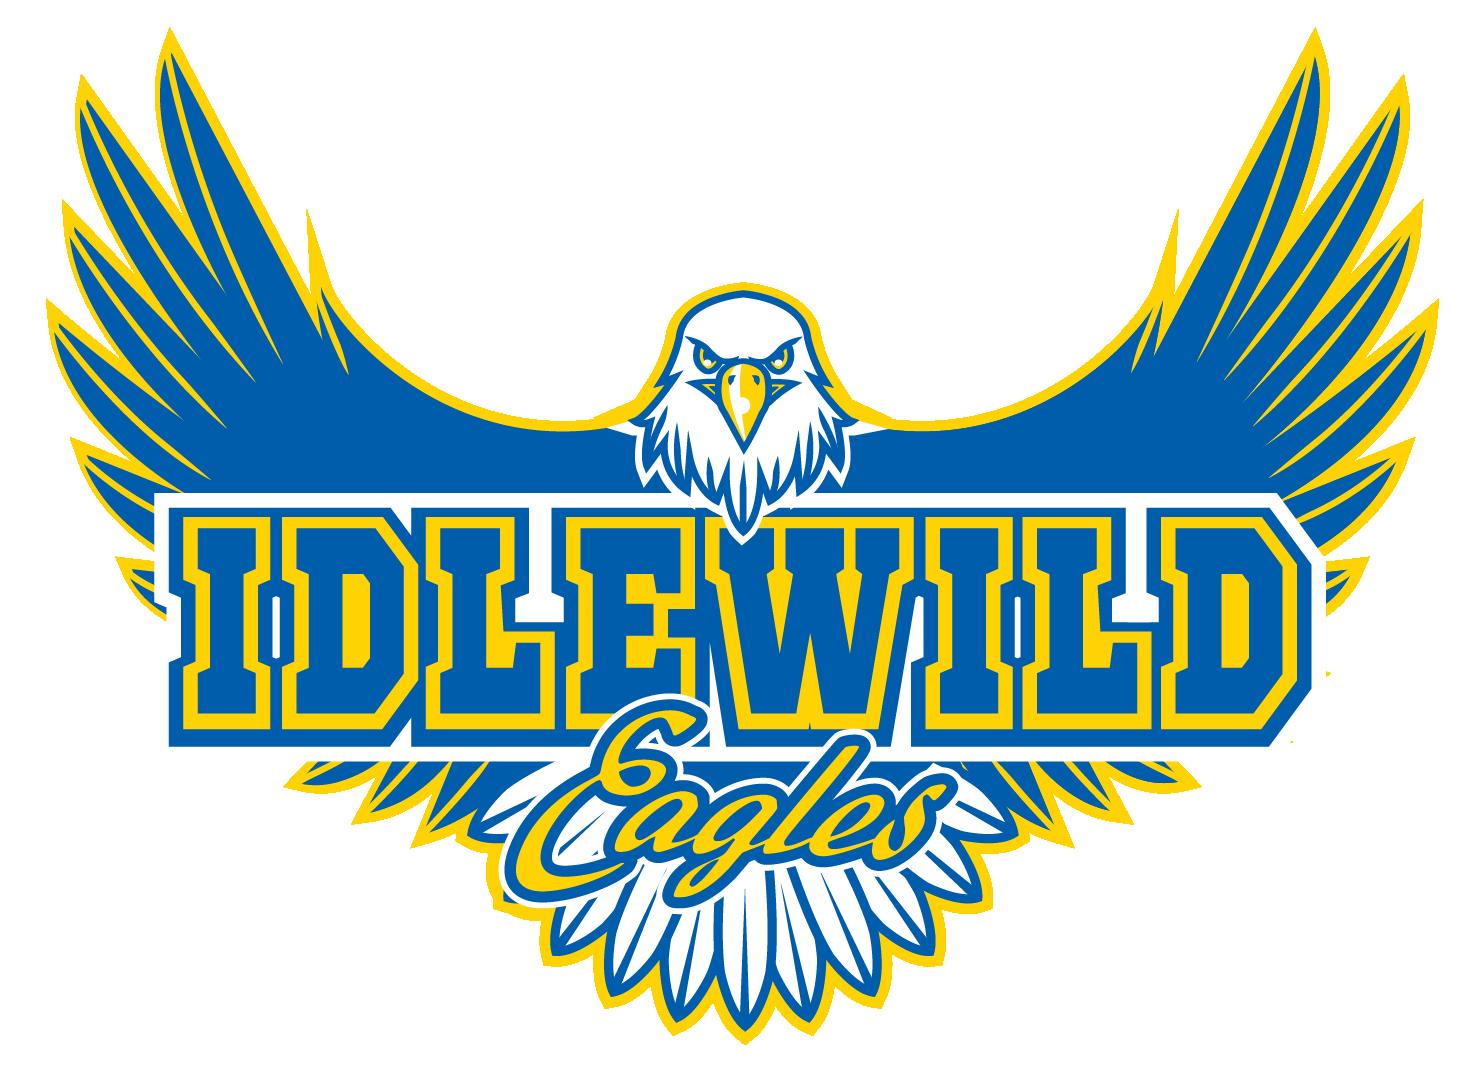 Idlewild Elementary